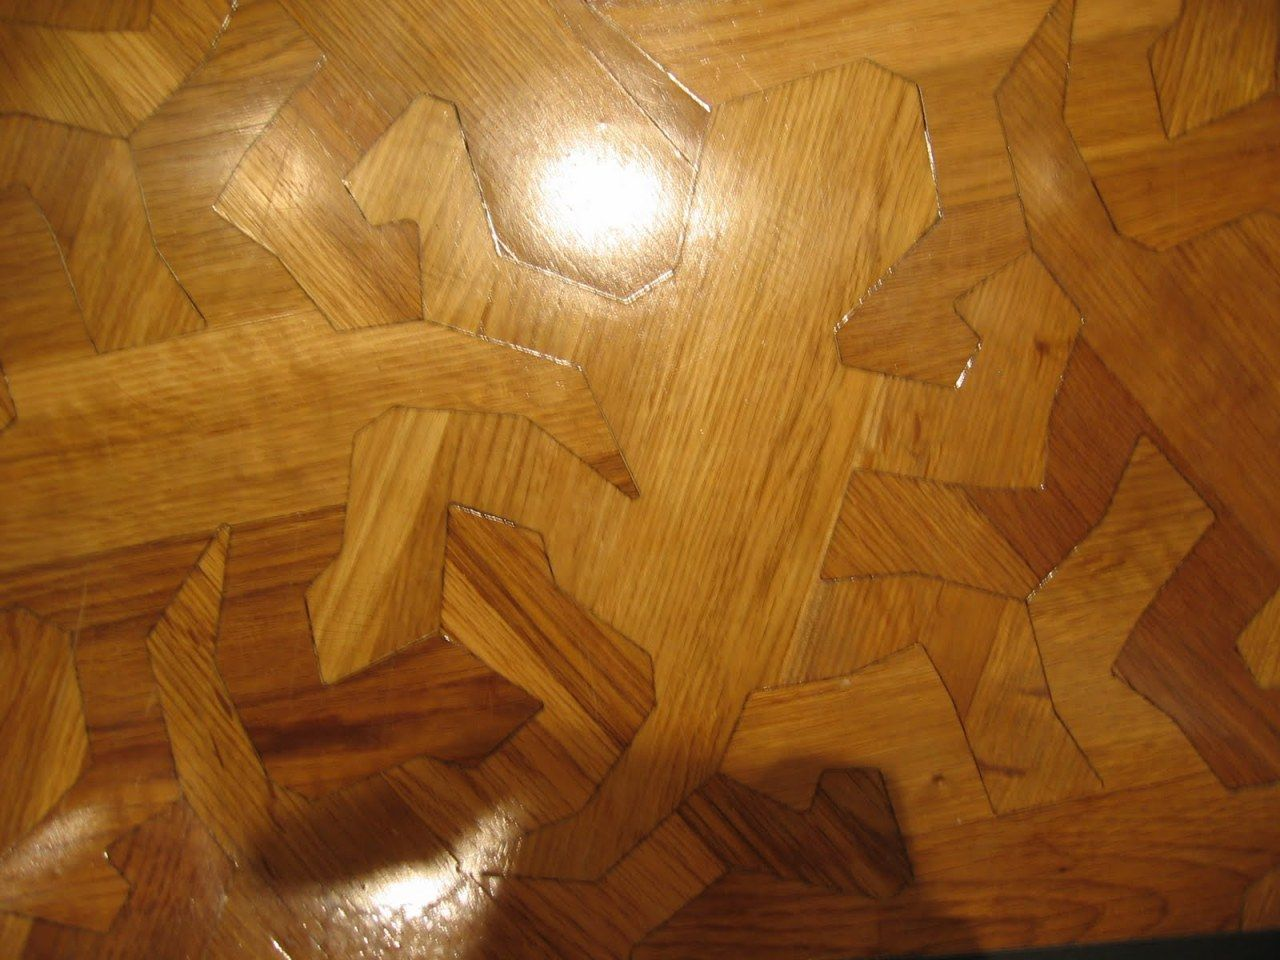 Wooden floor pattern based on m c eschers reptiles floor m c escher reptiles wooden floor doublecrazyfo Images